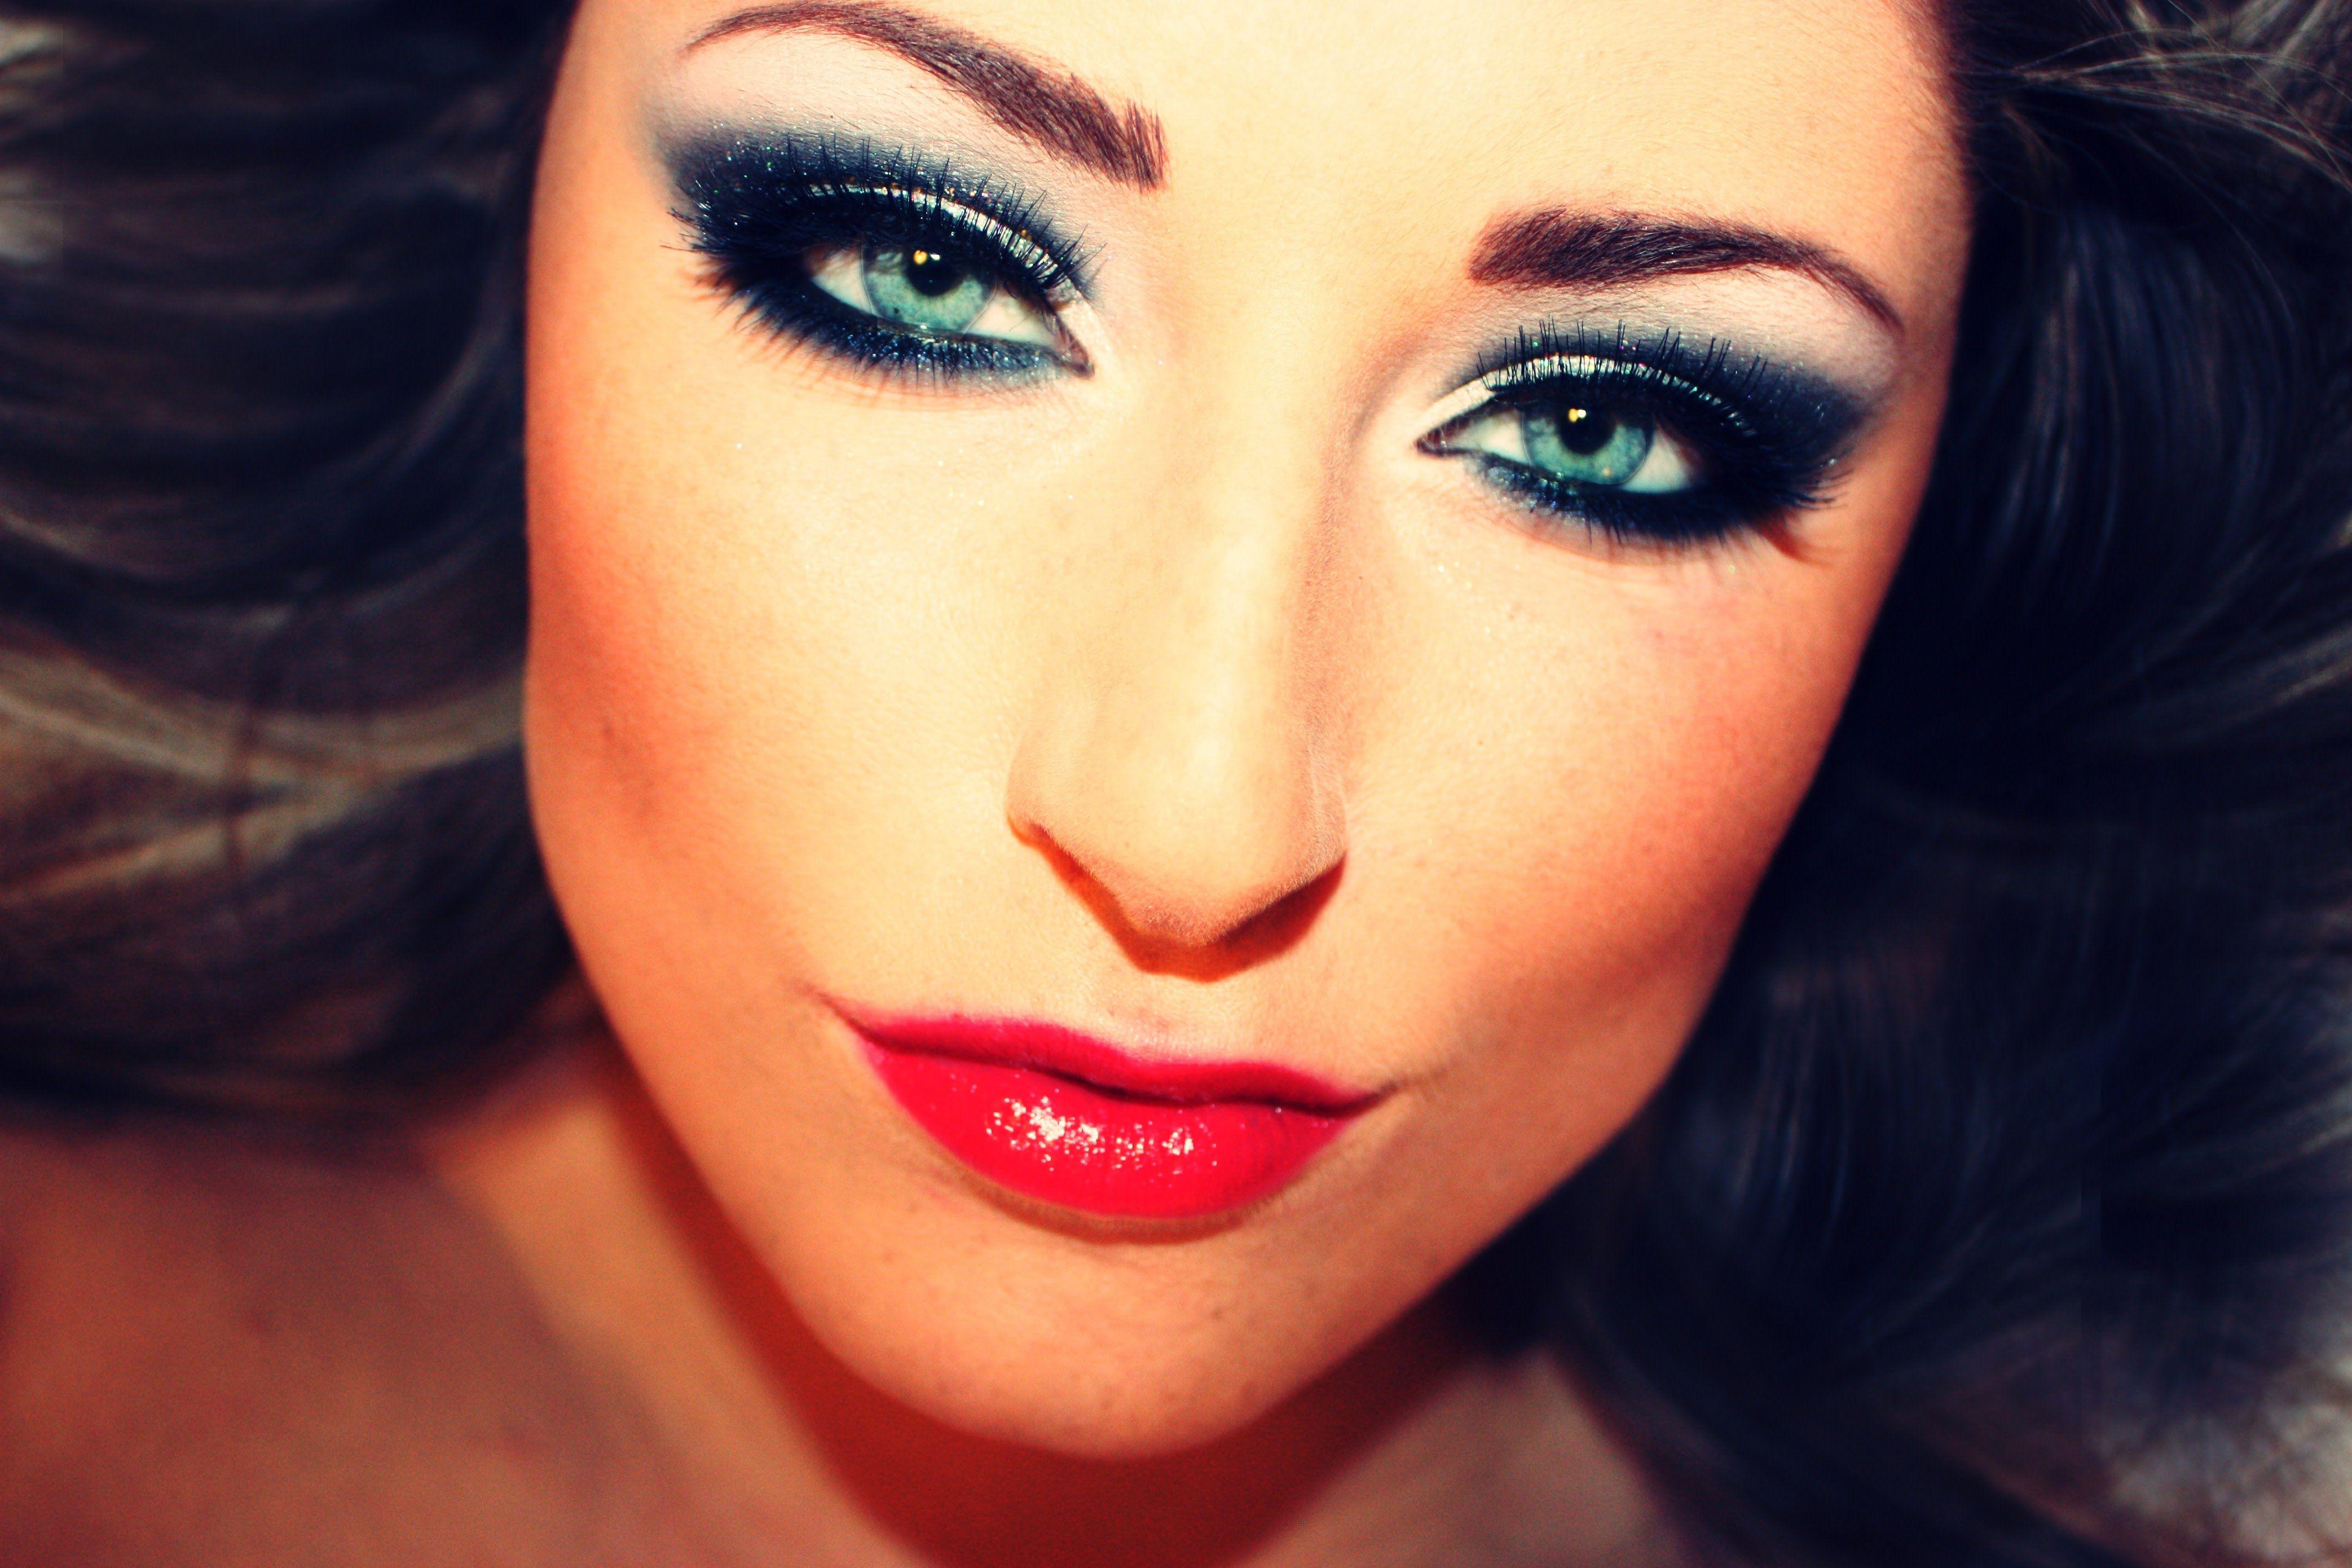 Pin by Jackie Romero on make up | Dark eye makeup, Natural